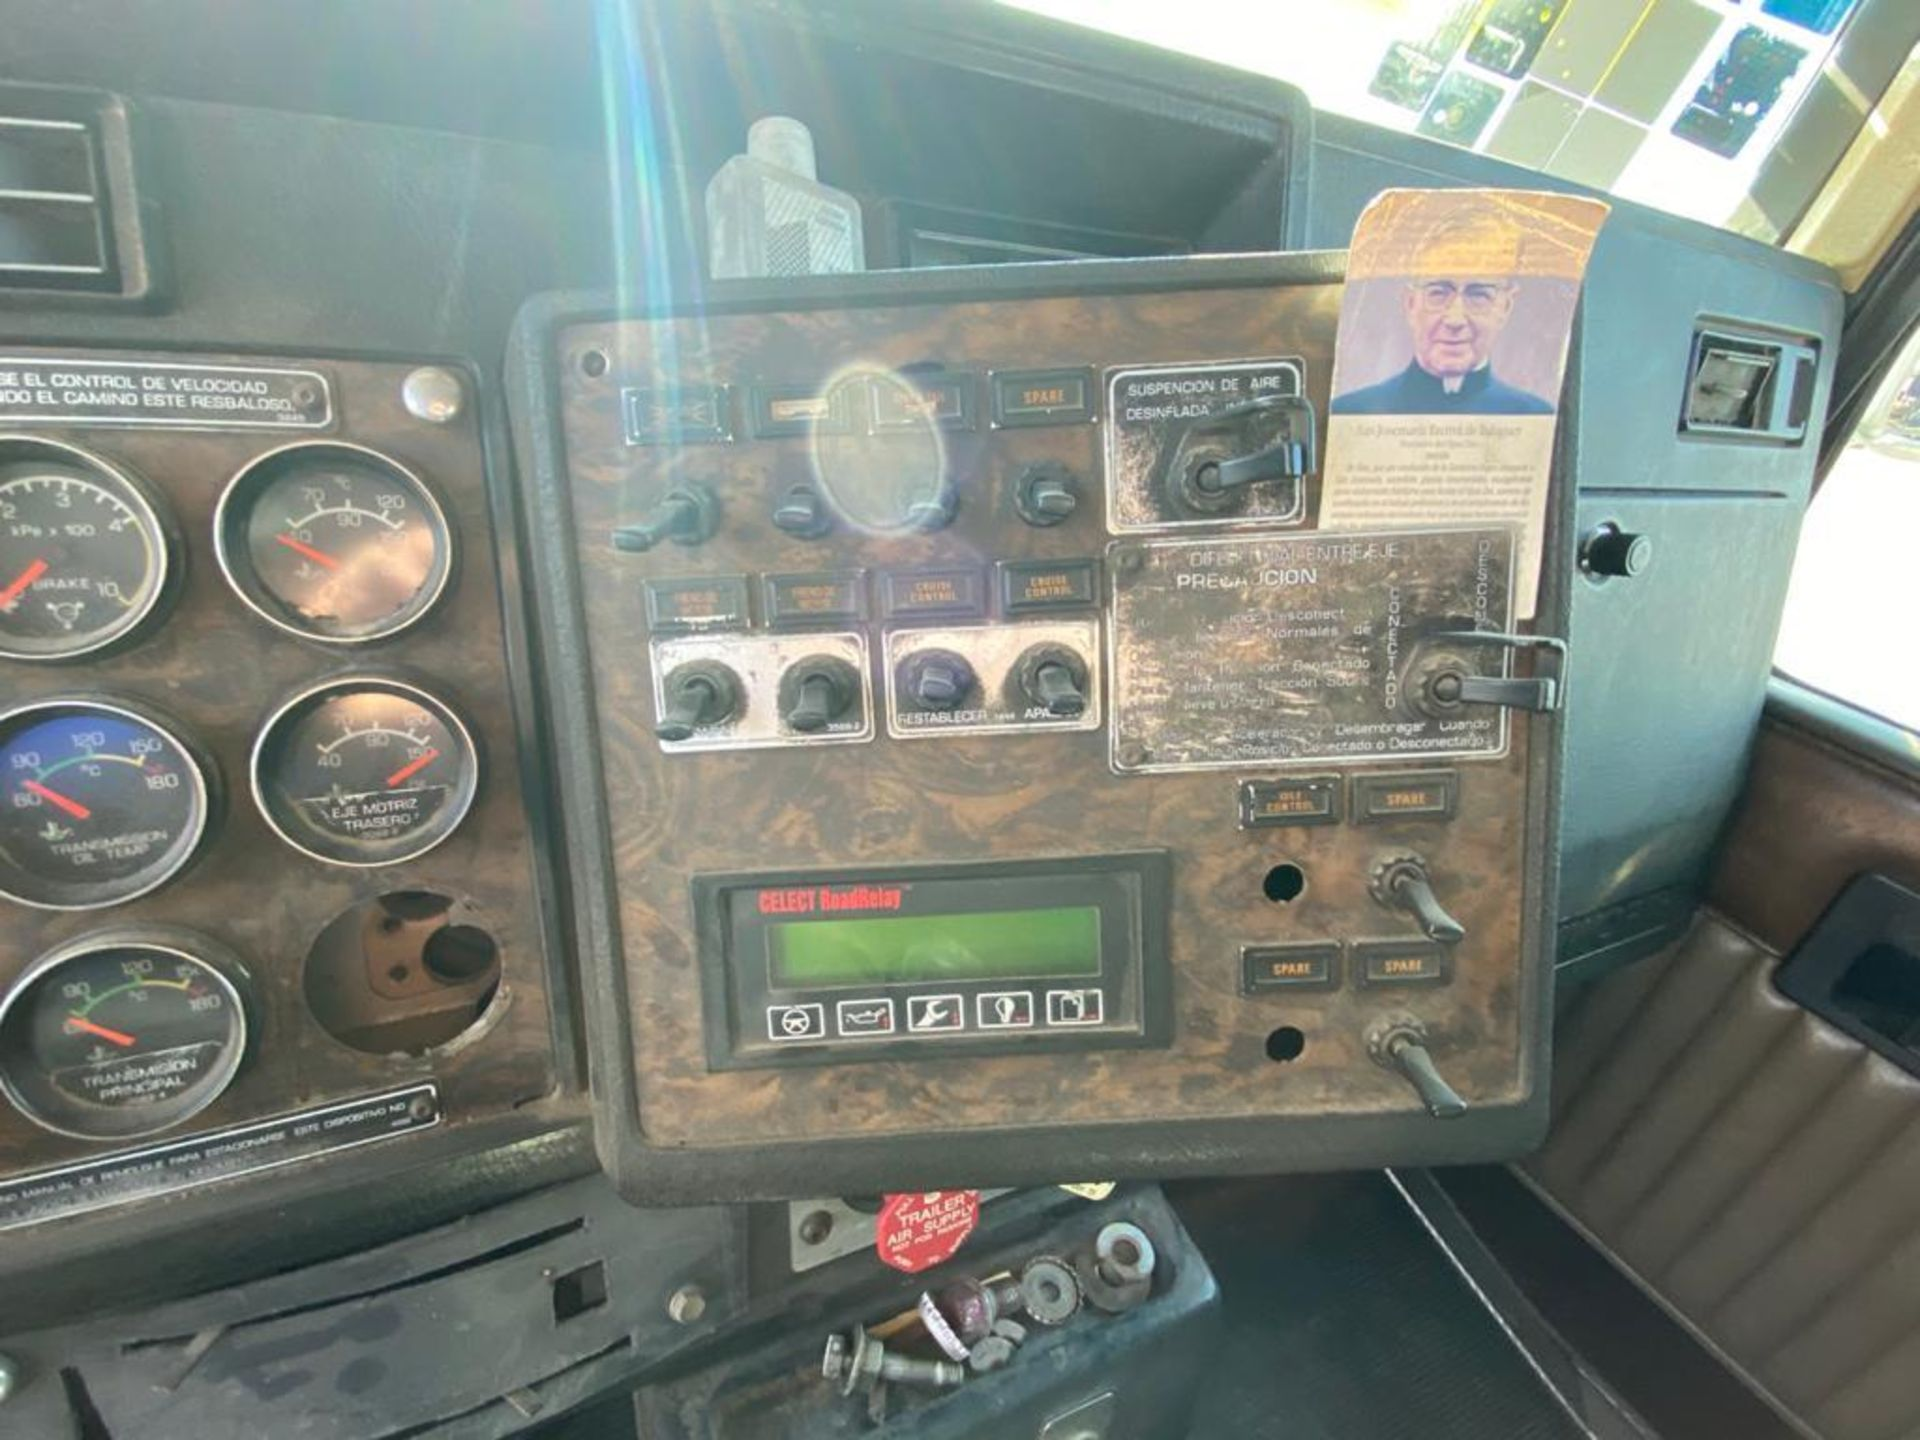 1998 Kenworth Sleeper Truck Tractor, standard transmission of 18 speeds - Image 32 of 55